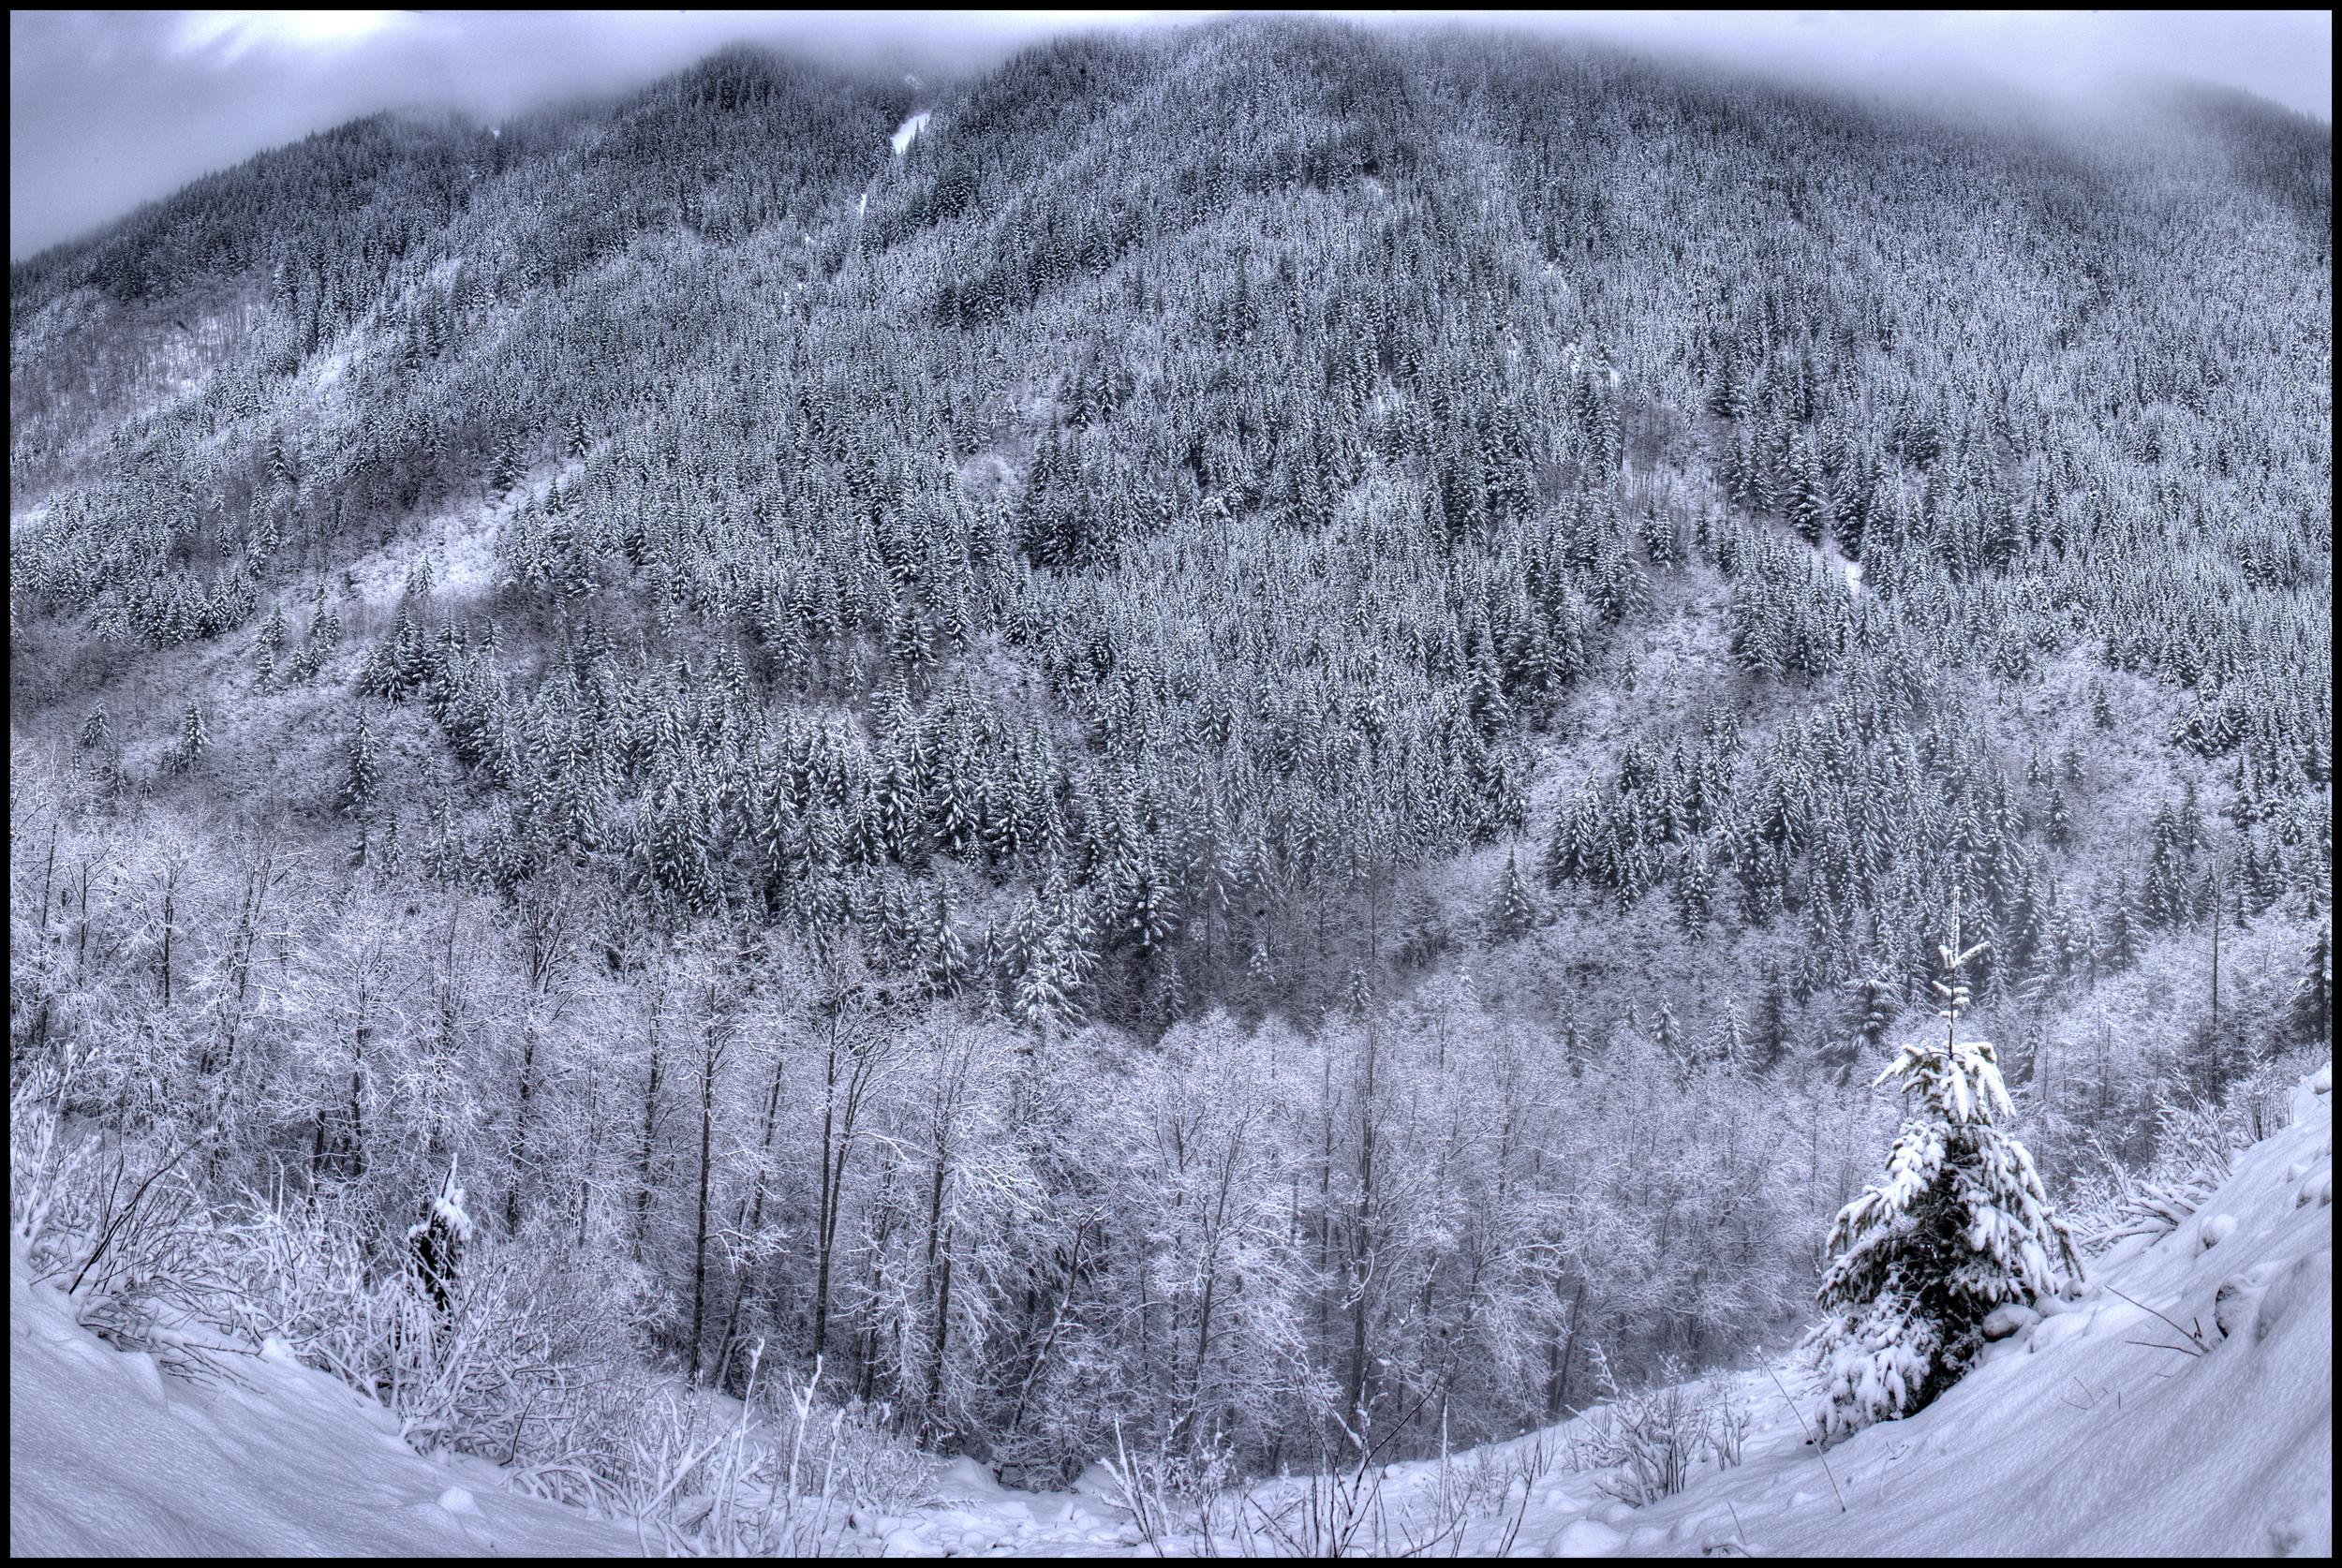 Near Mt. Hood, OR